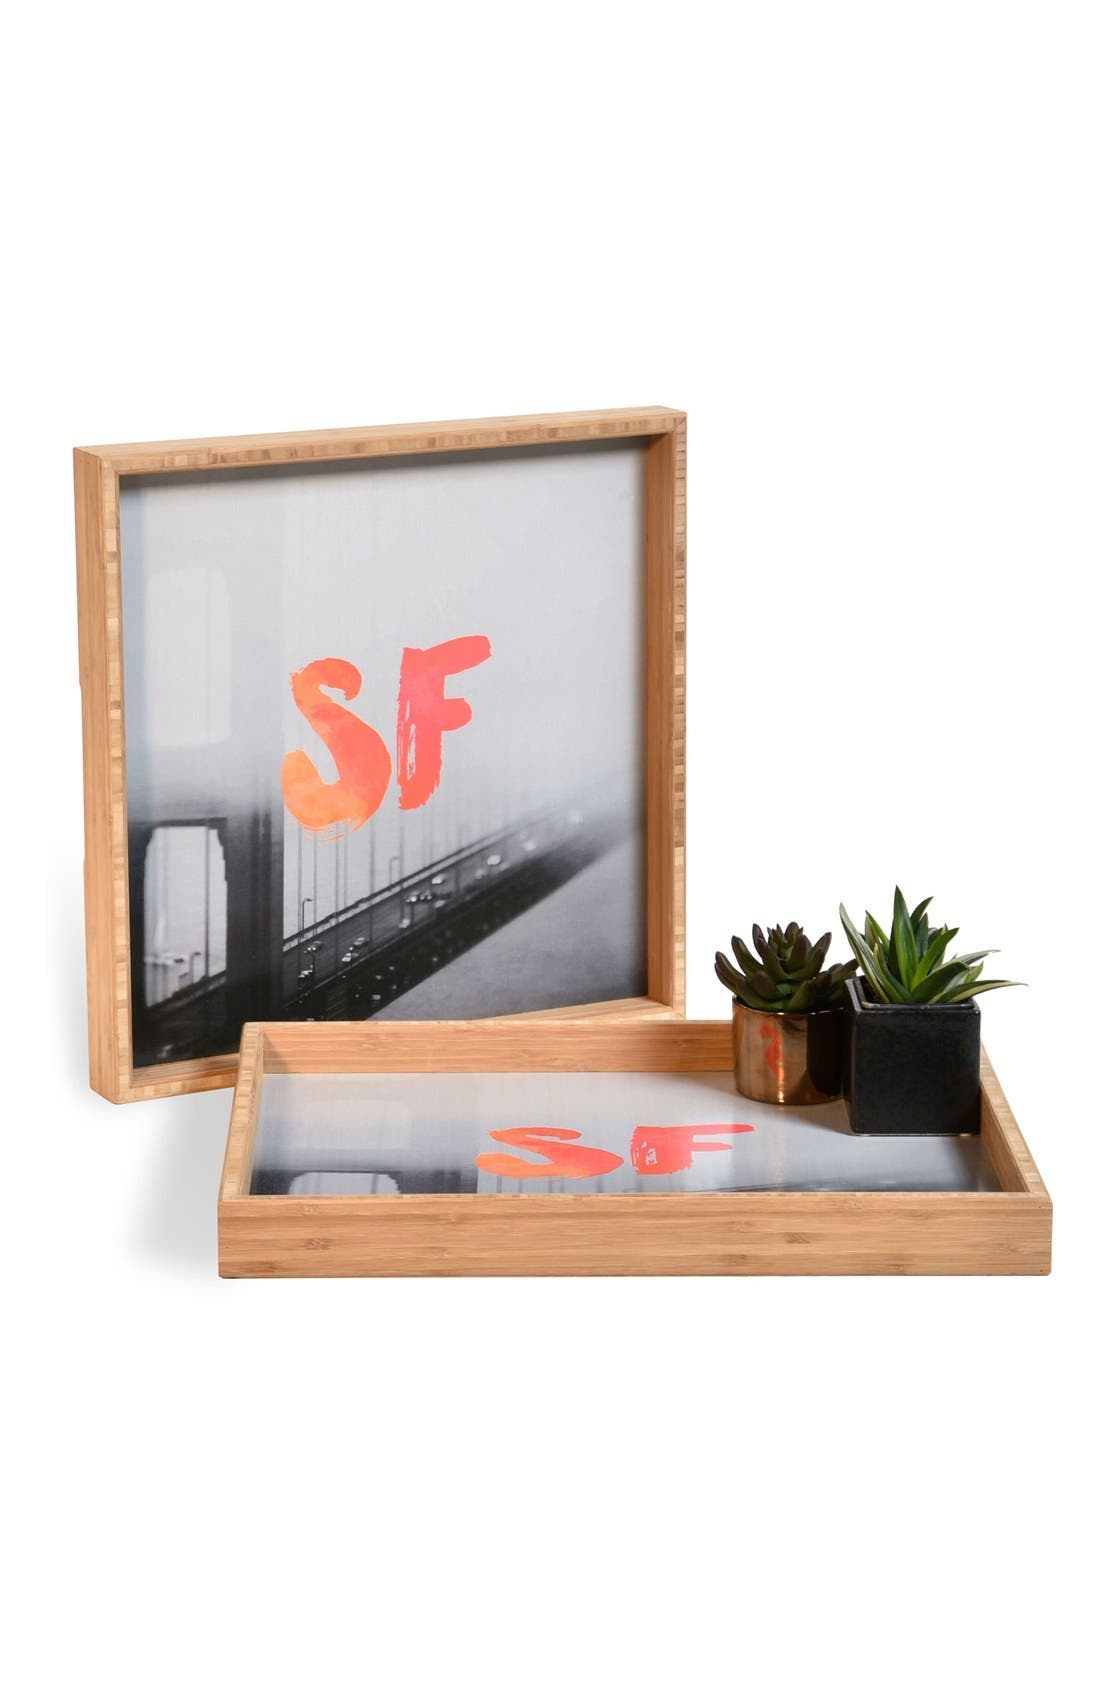 DENY Designs 'Golden Gate Noir' Decorative Serving Tray